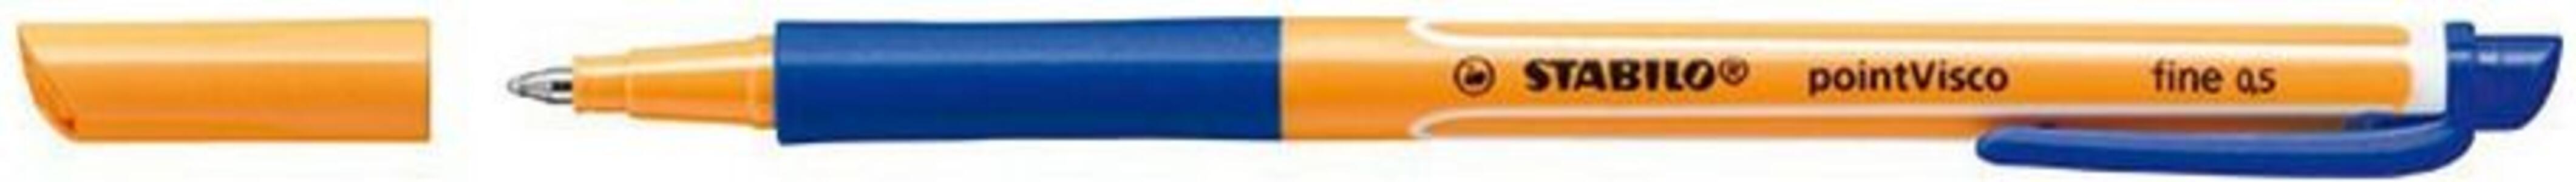 STABILO pointVisco Blu 1 pezzo(i)